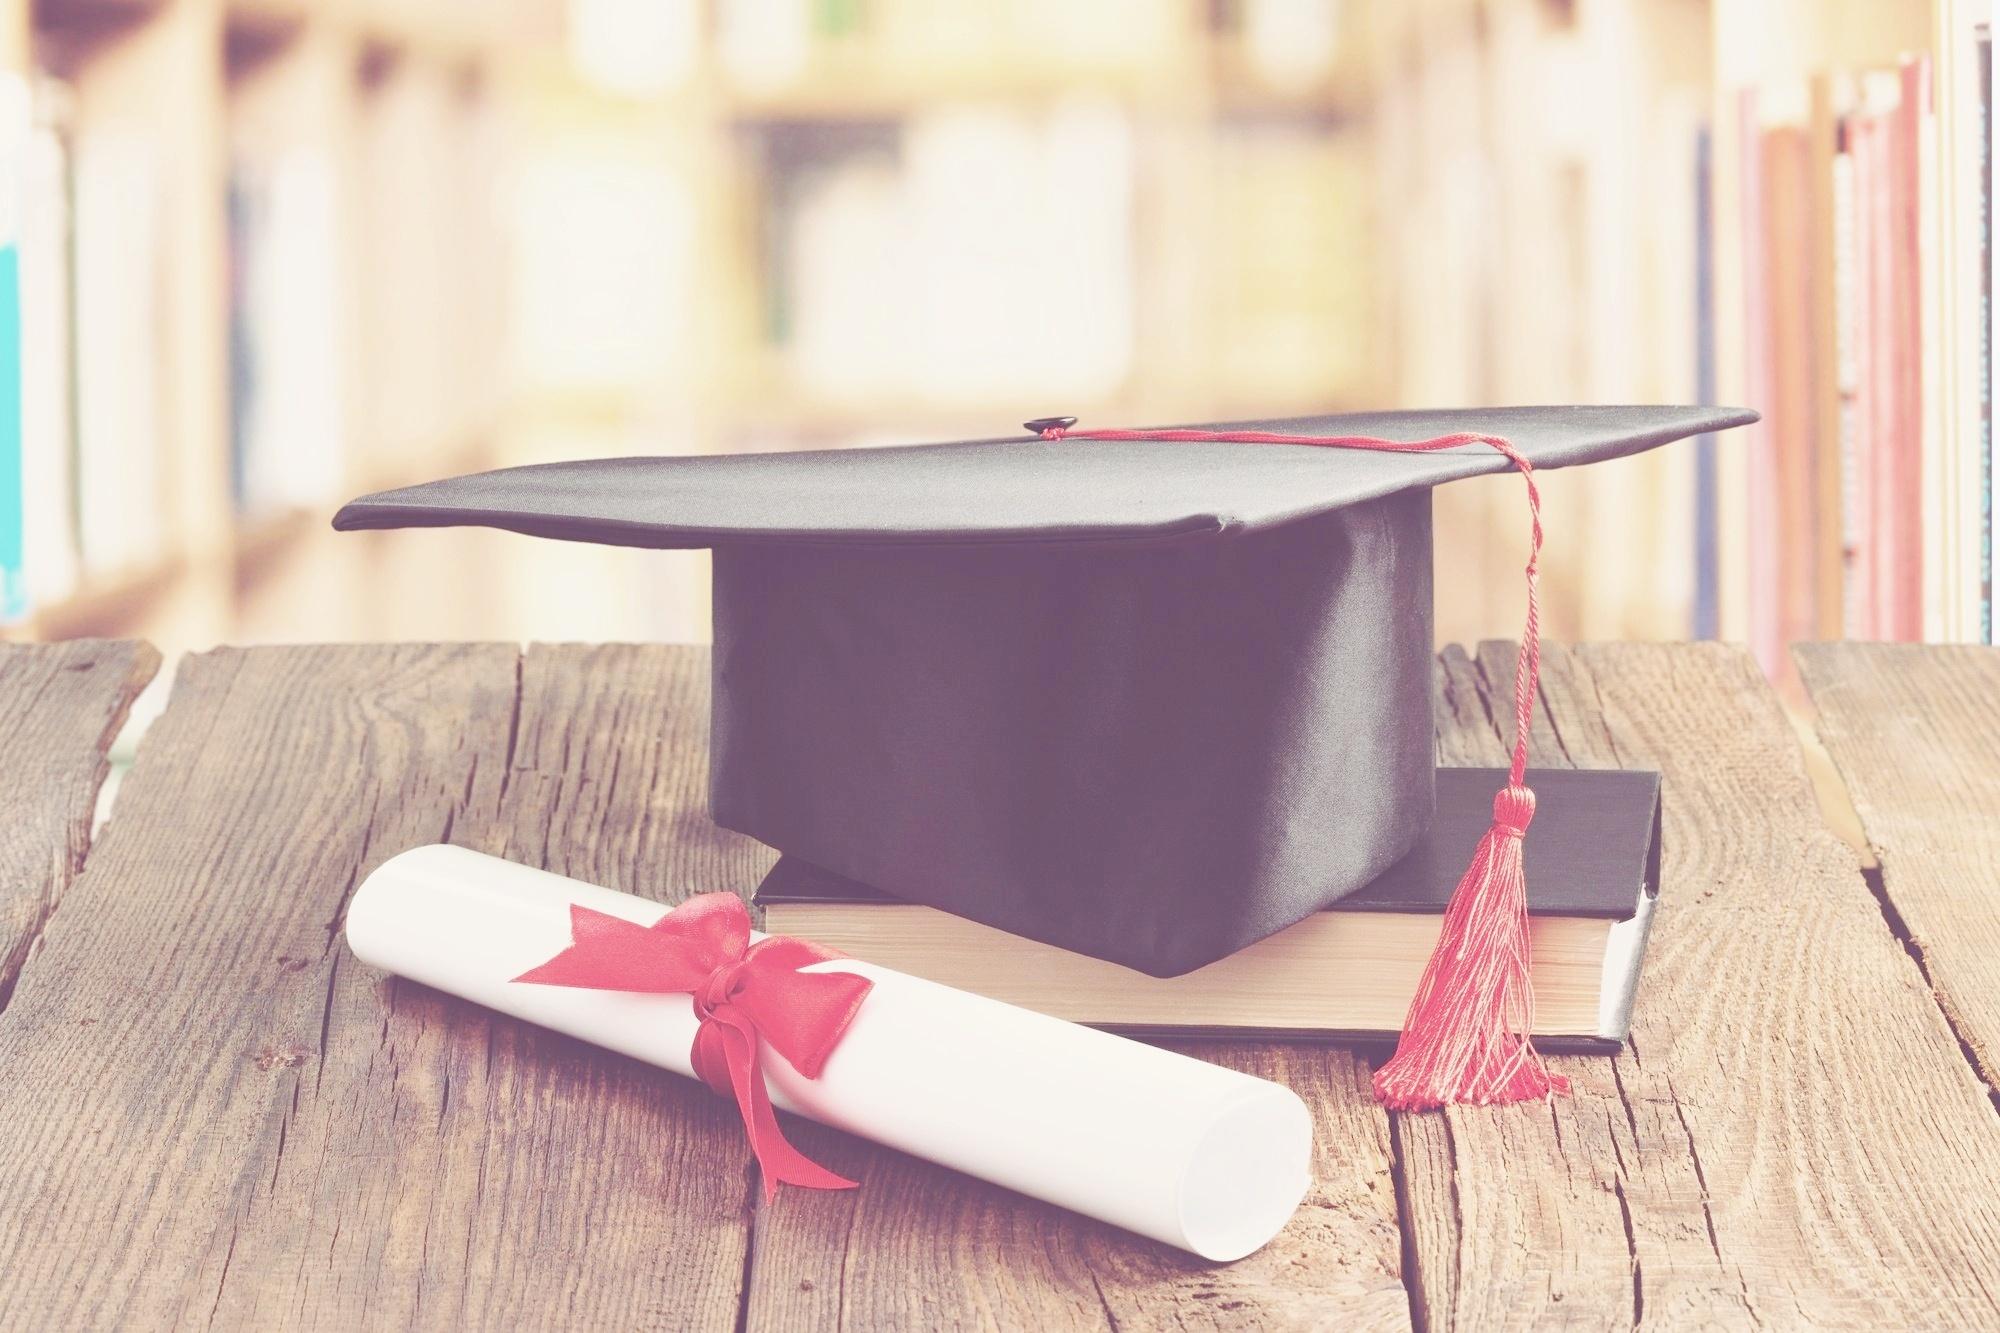 customerserv scholarship-381044-edited.jpg